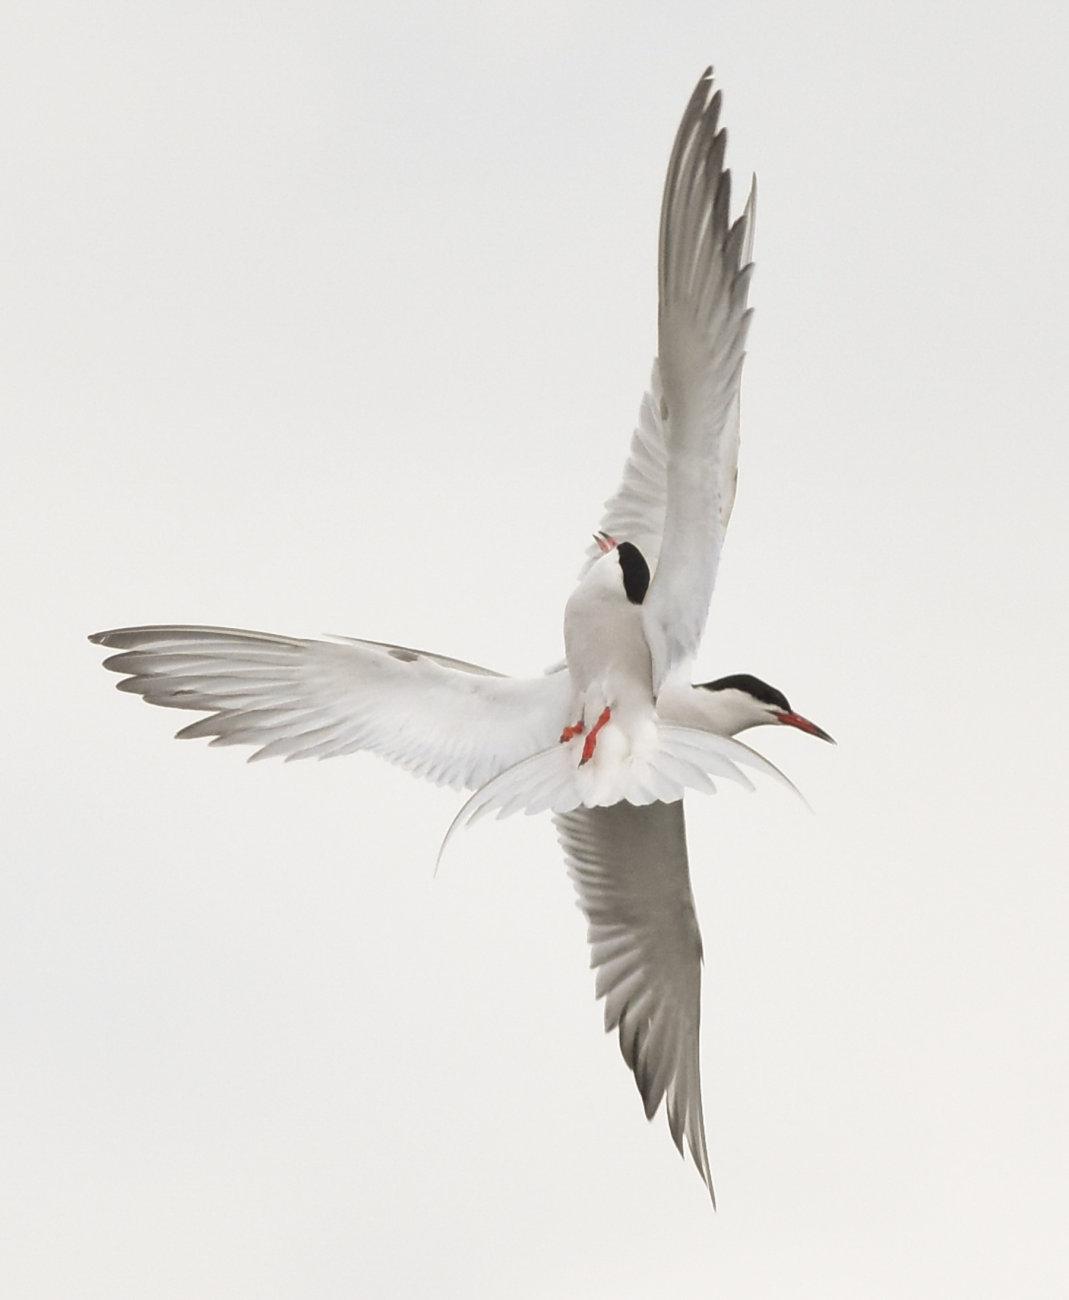 Common Terns crossing over in flight